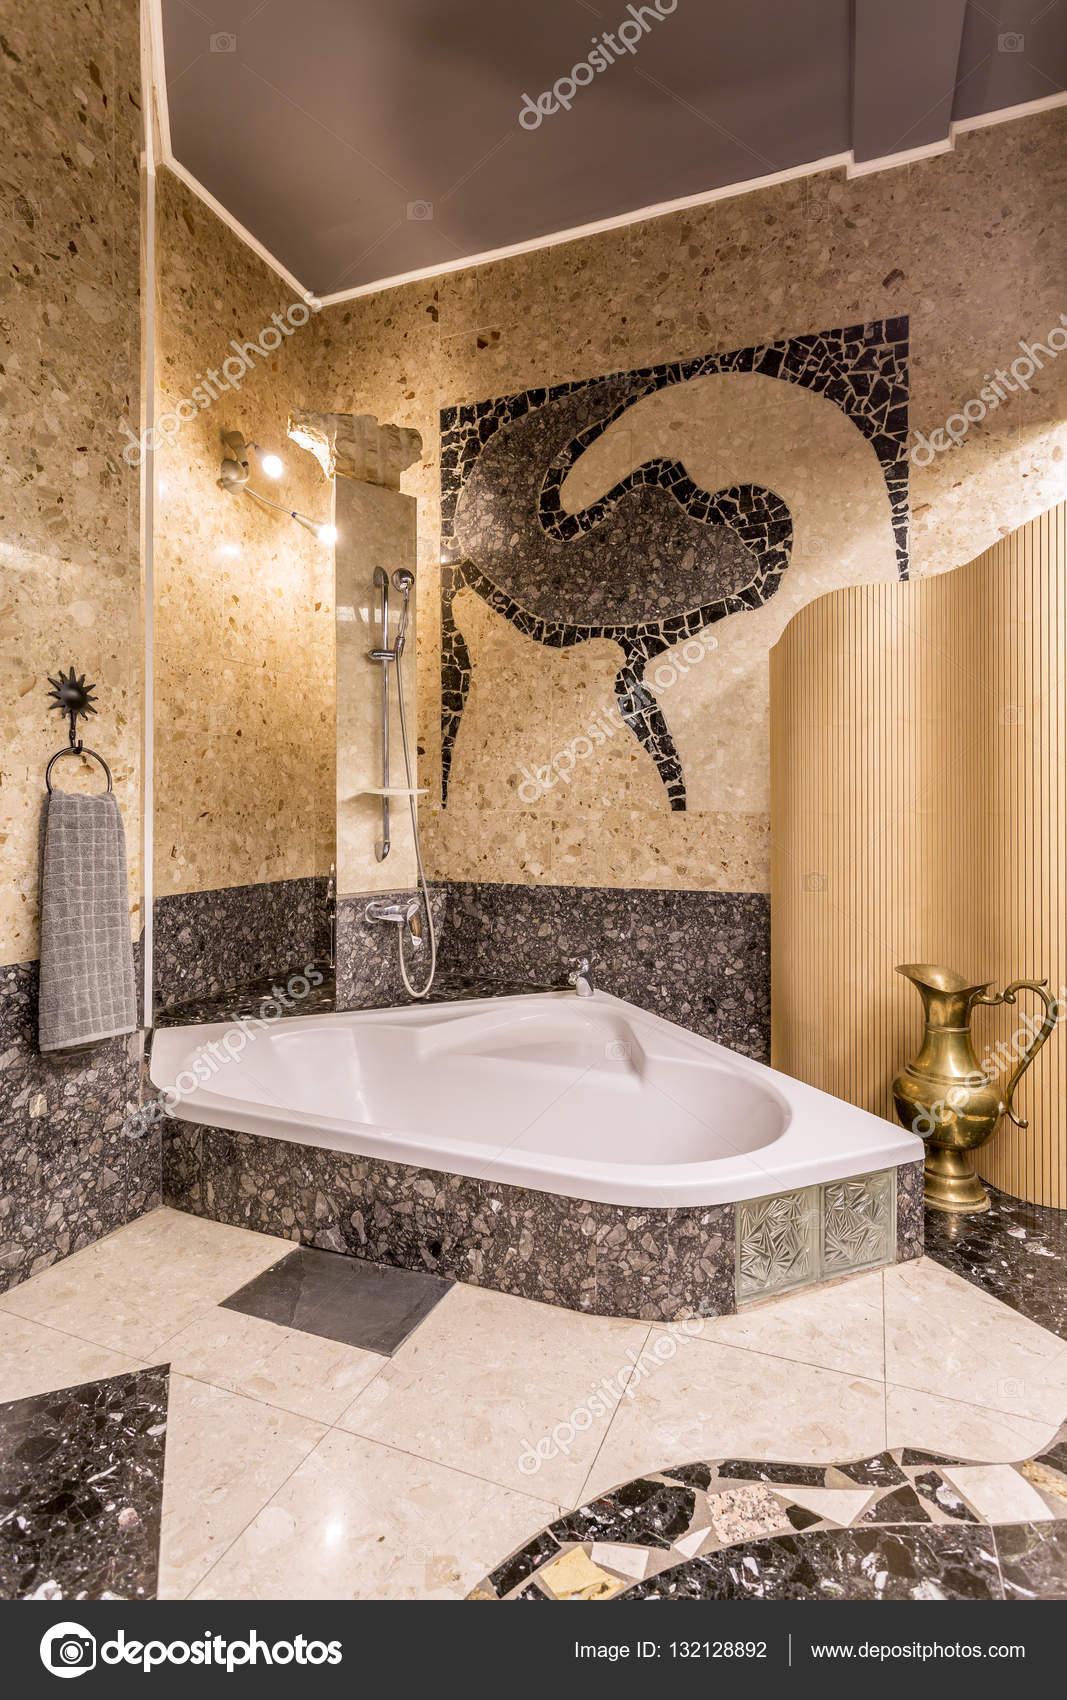 https://st3.depositphotos.com/2249091/13212/i/1600/depositphotos_132128892-stock-photo-elegant-mosaic-bathroom-with-large.jpg